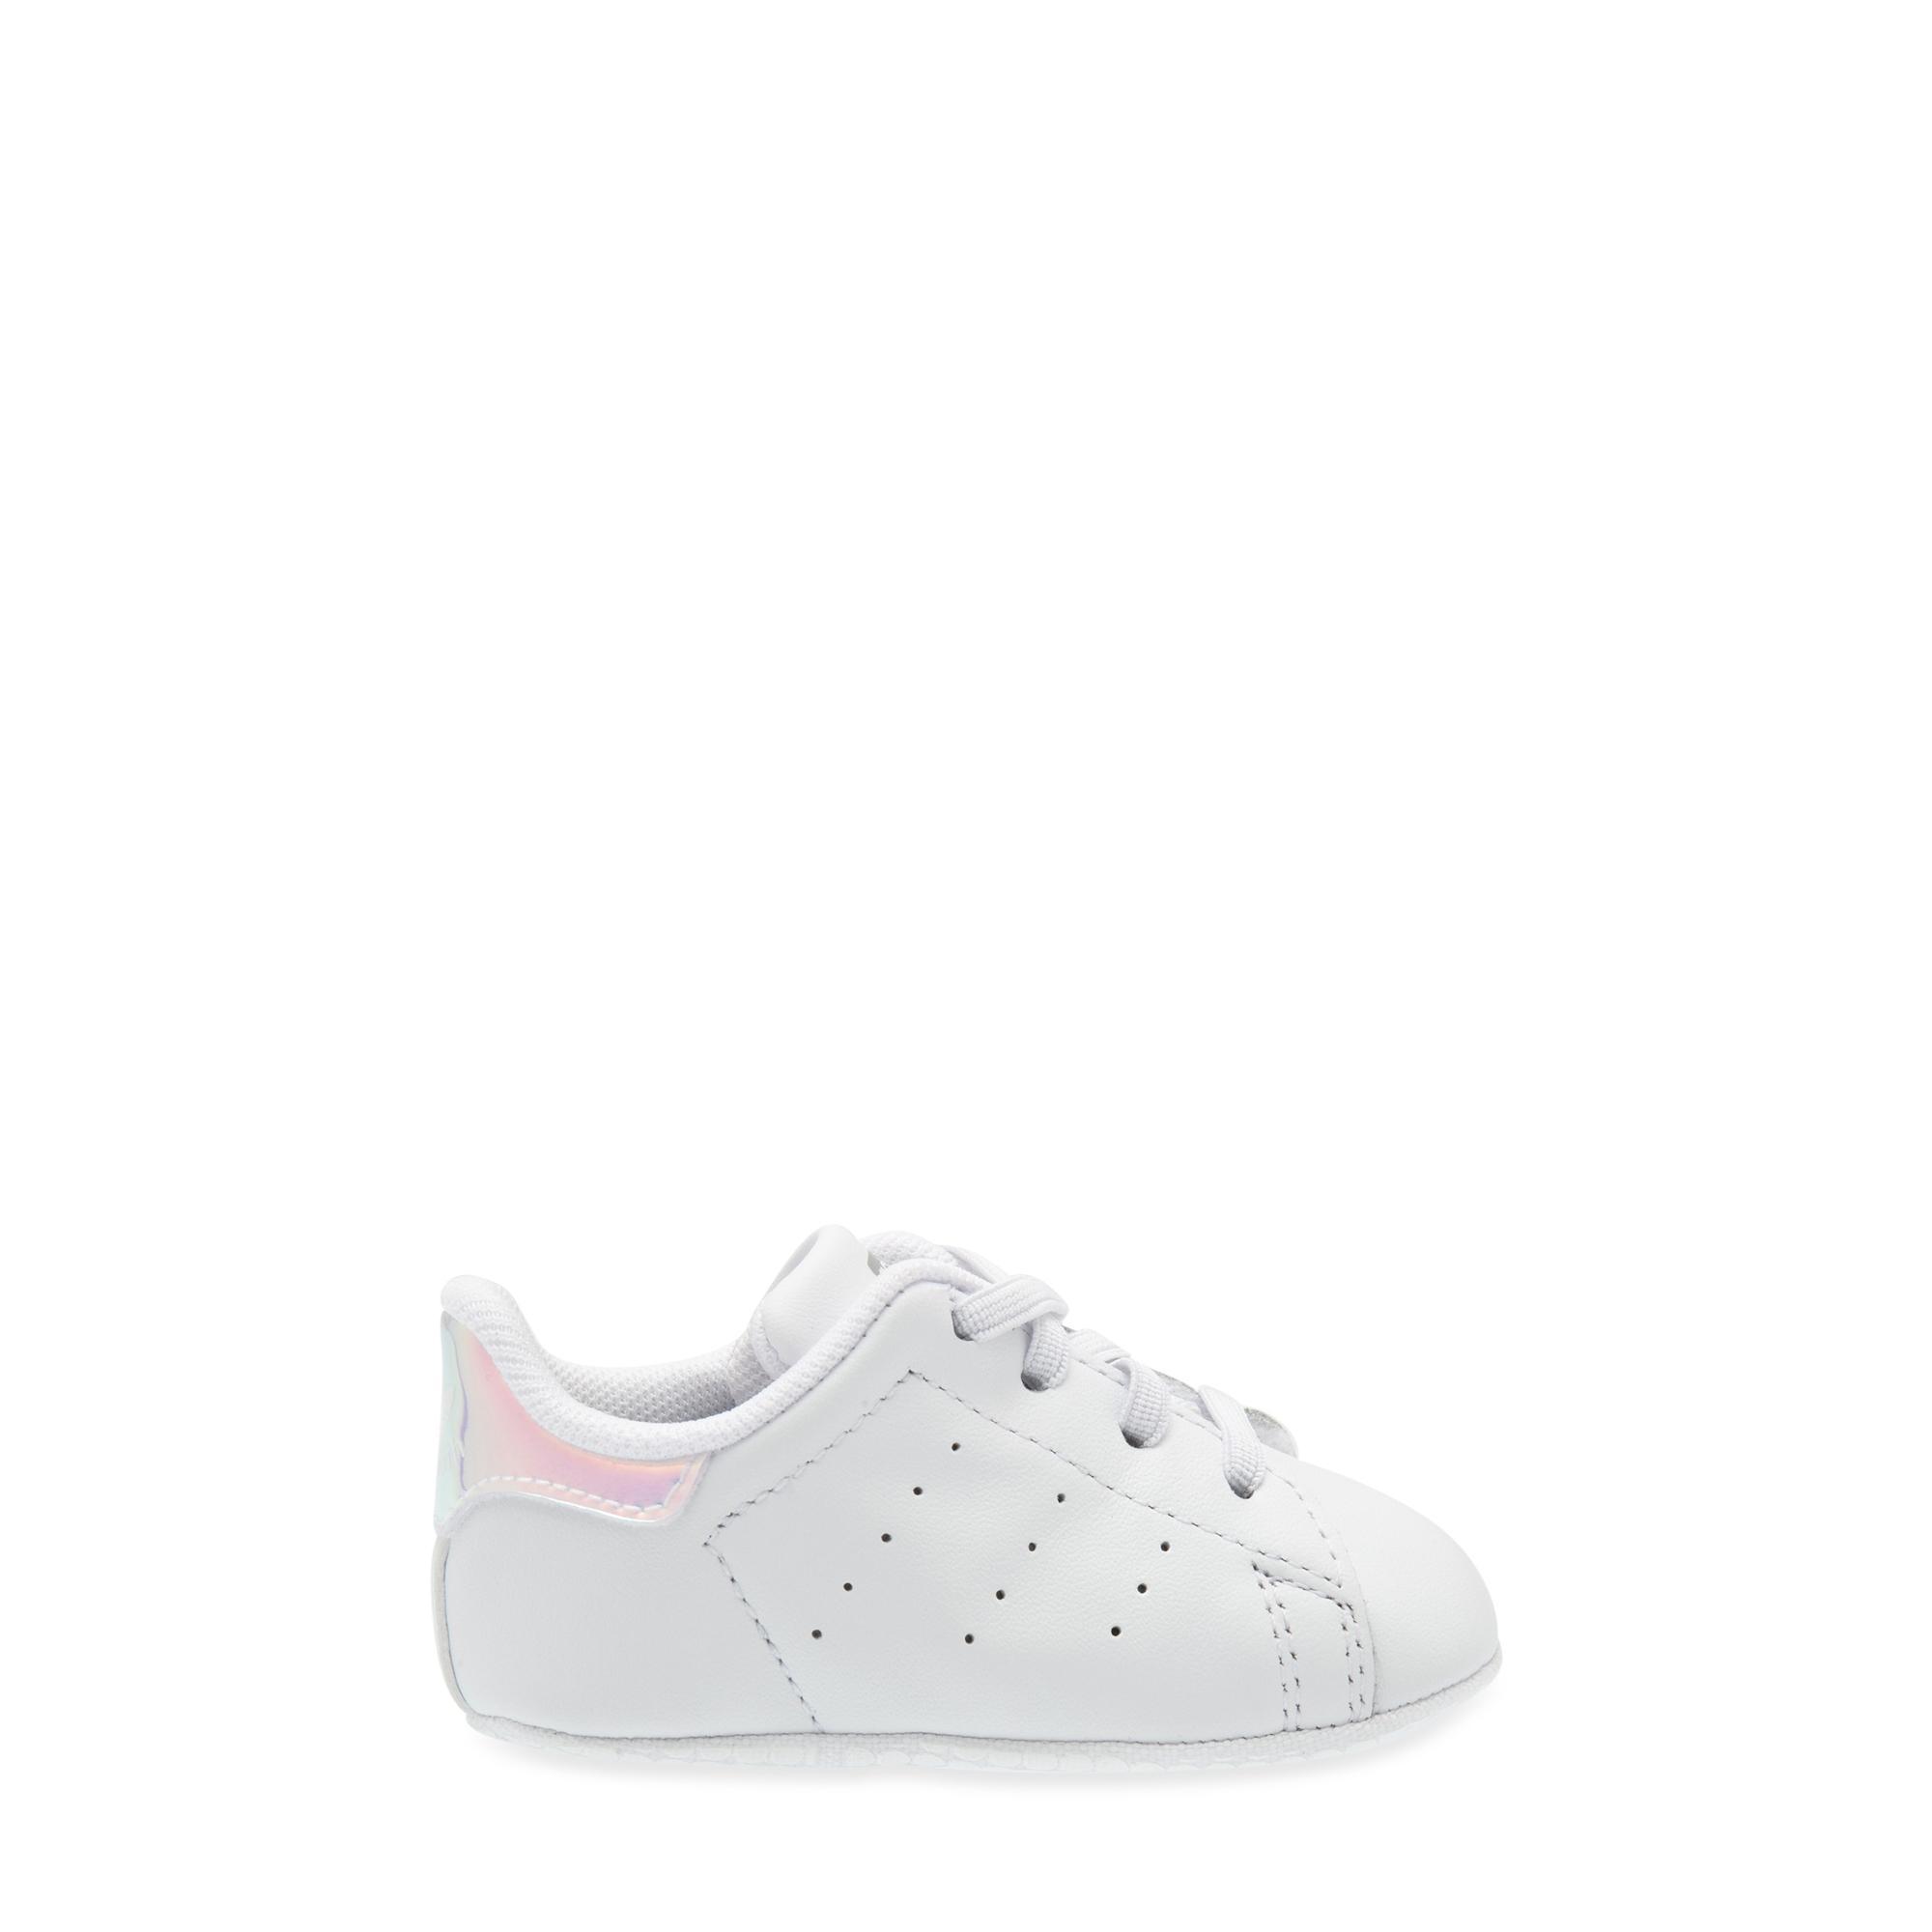 Stan Smith crib sneakers